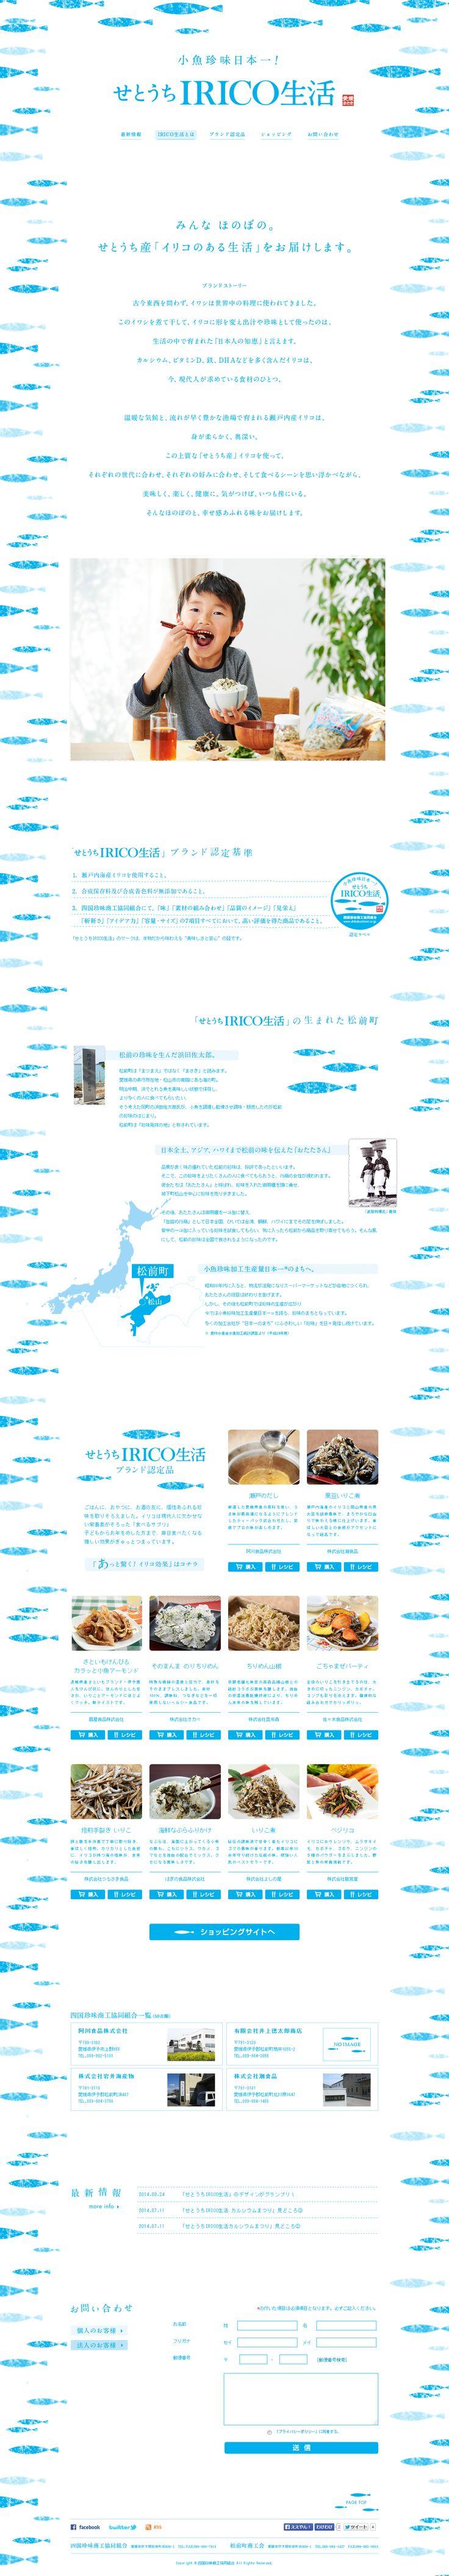 http://www.shikokuchinmi.or.jp/irico.php